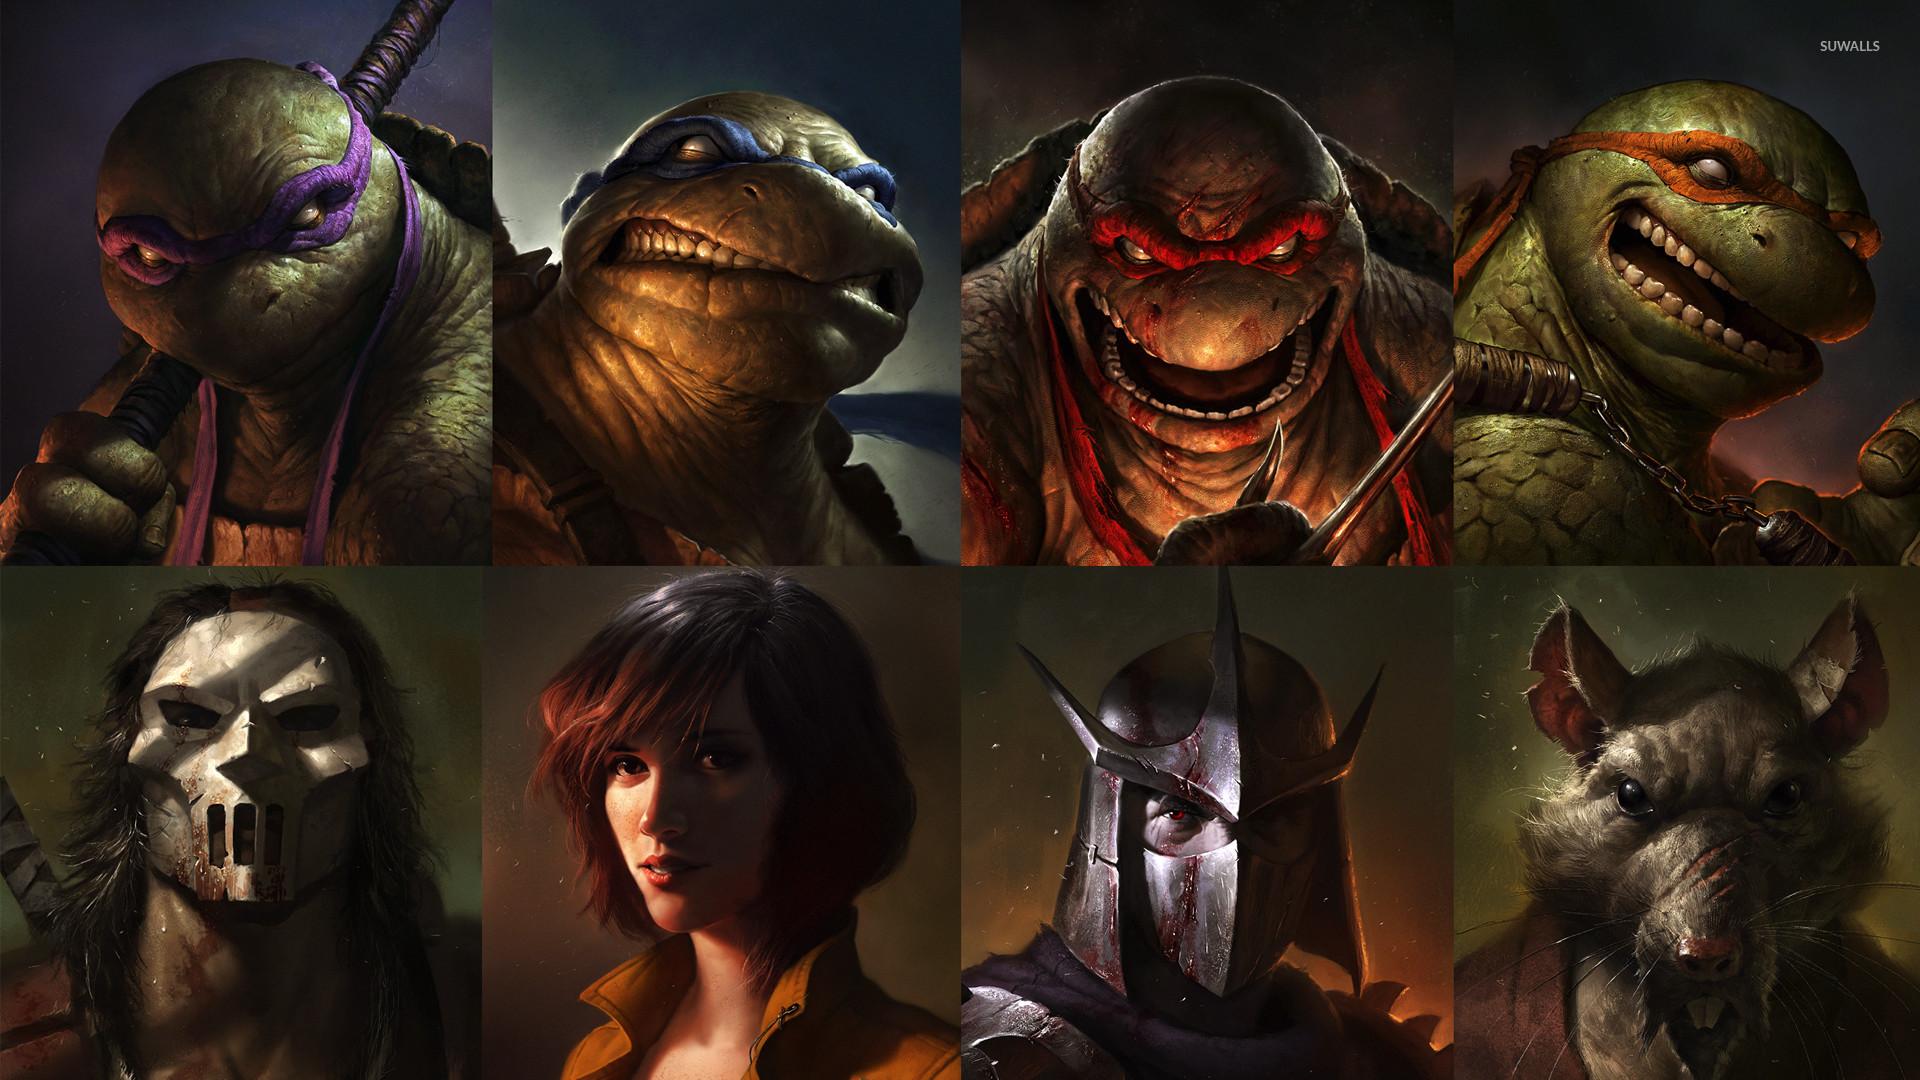 Teenage Mutant Ninja Turtles wallpaper jpg